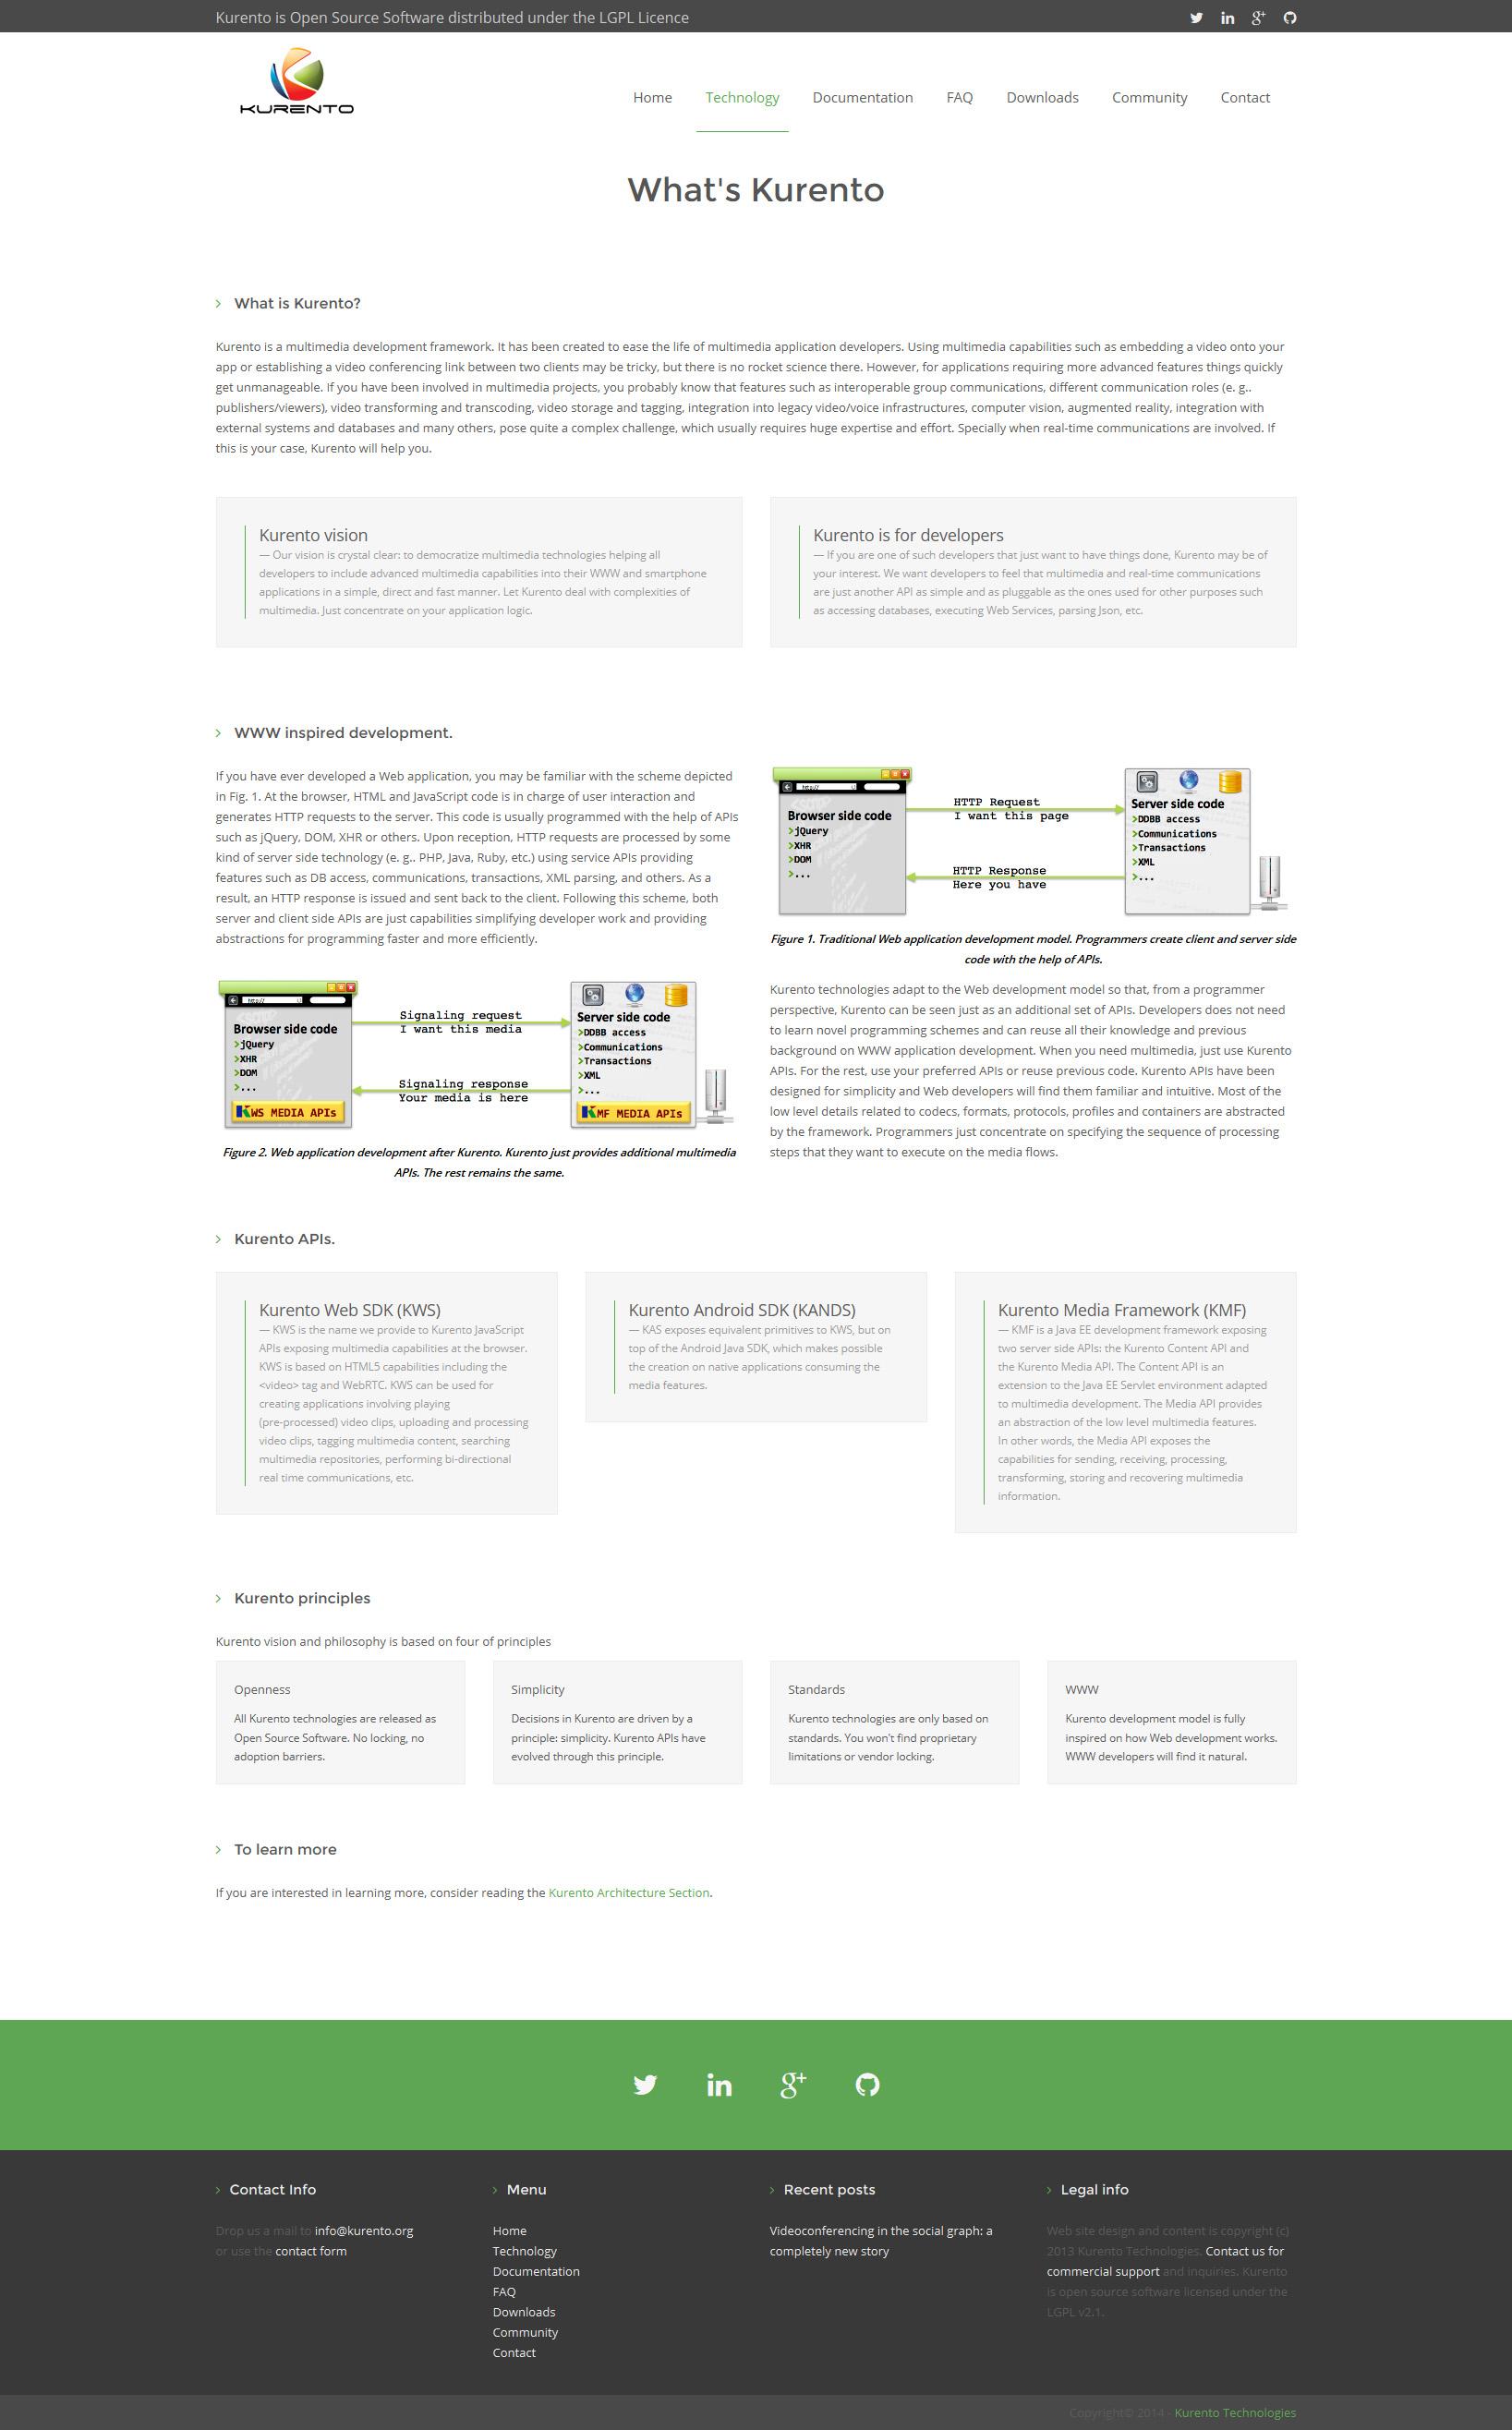 Kurento.org - What is